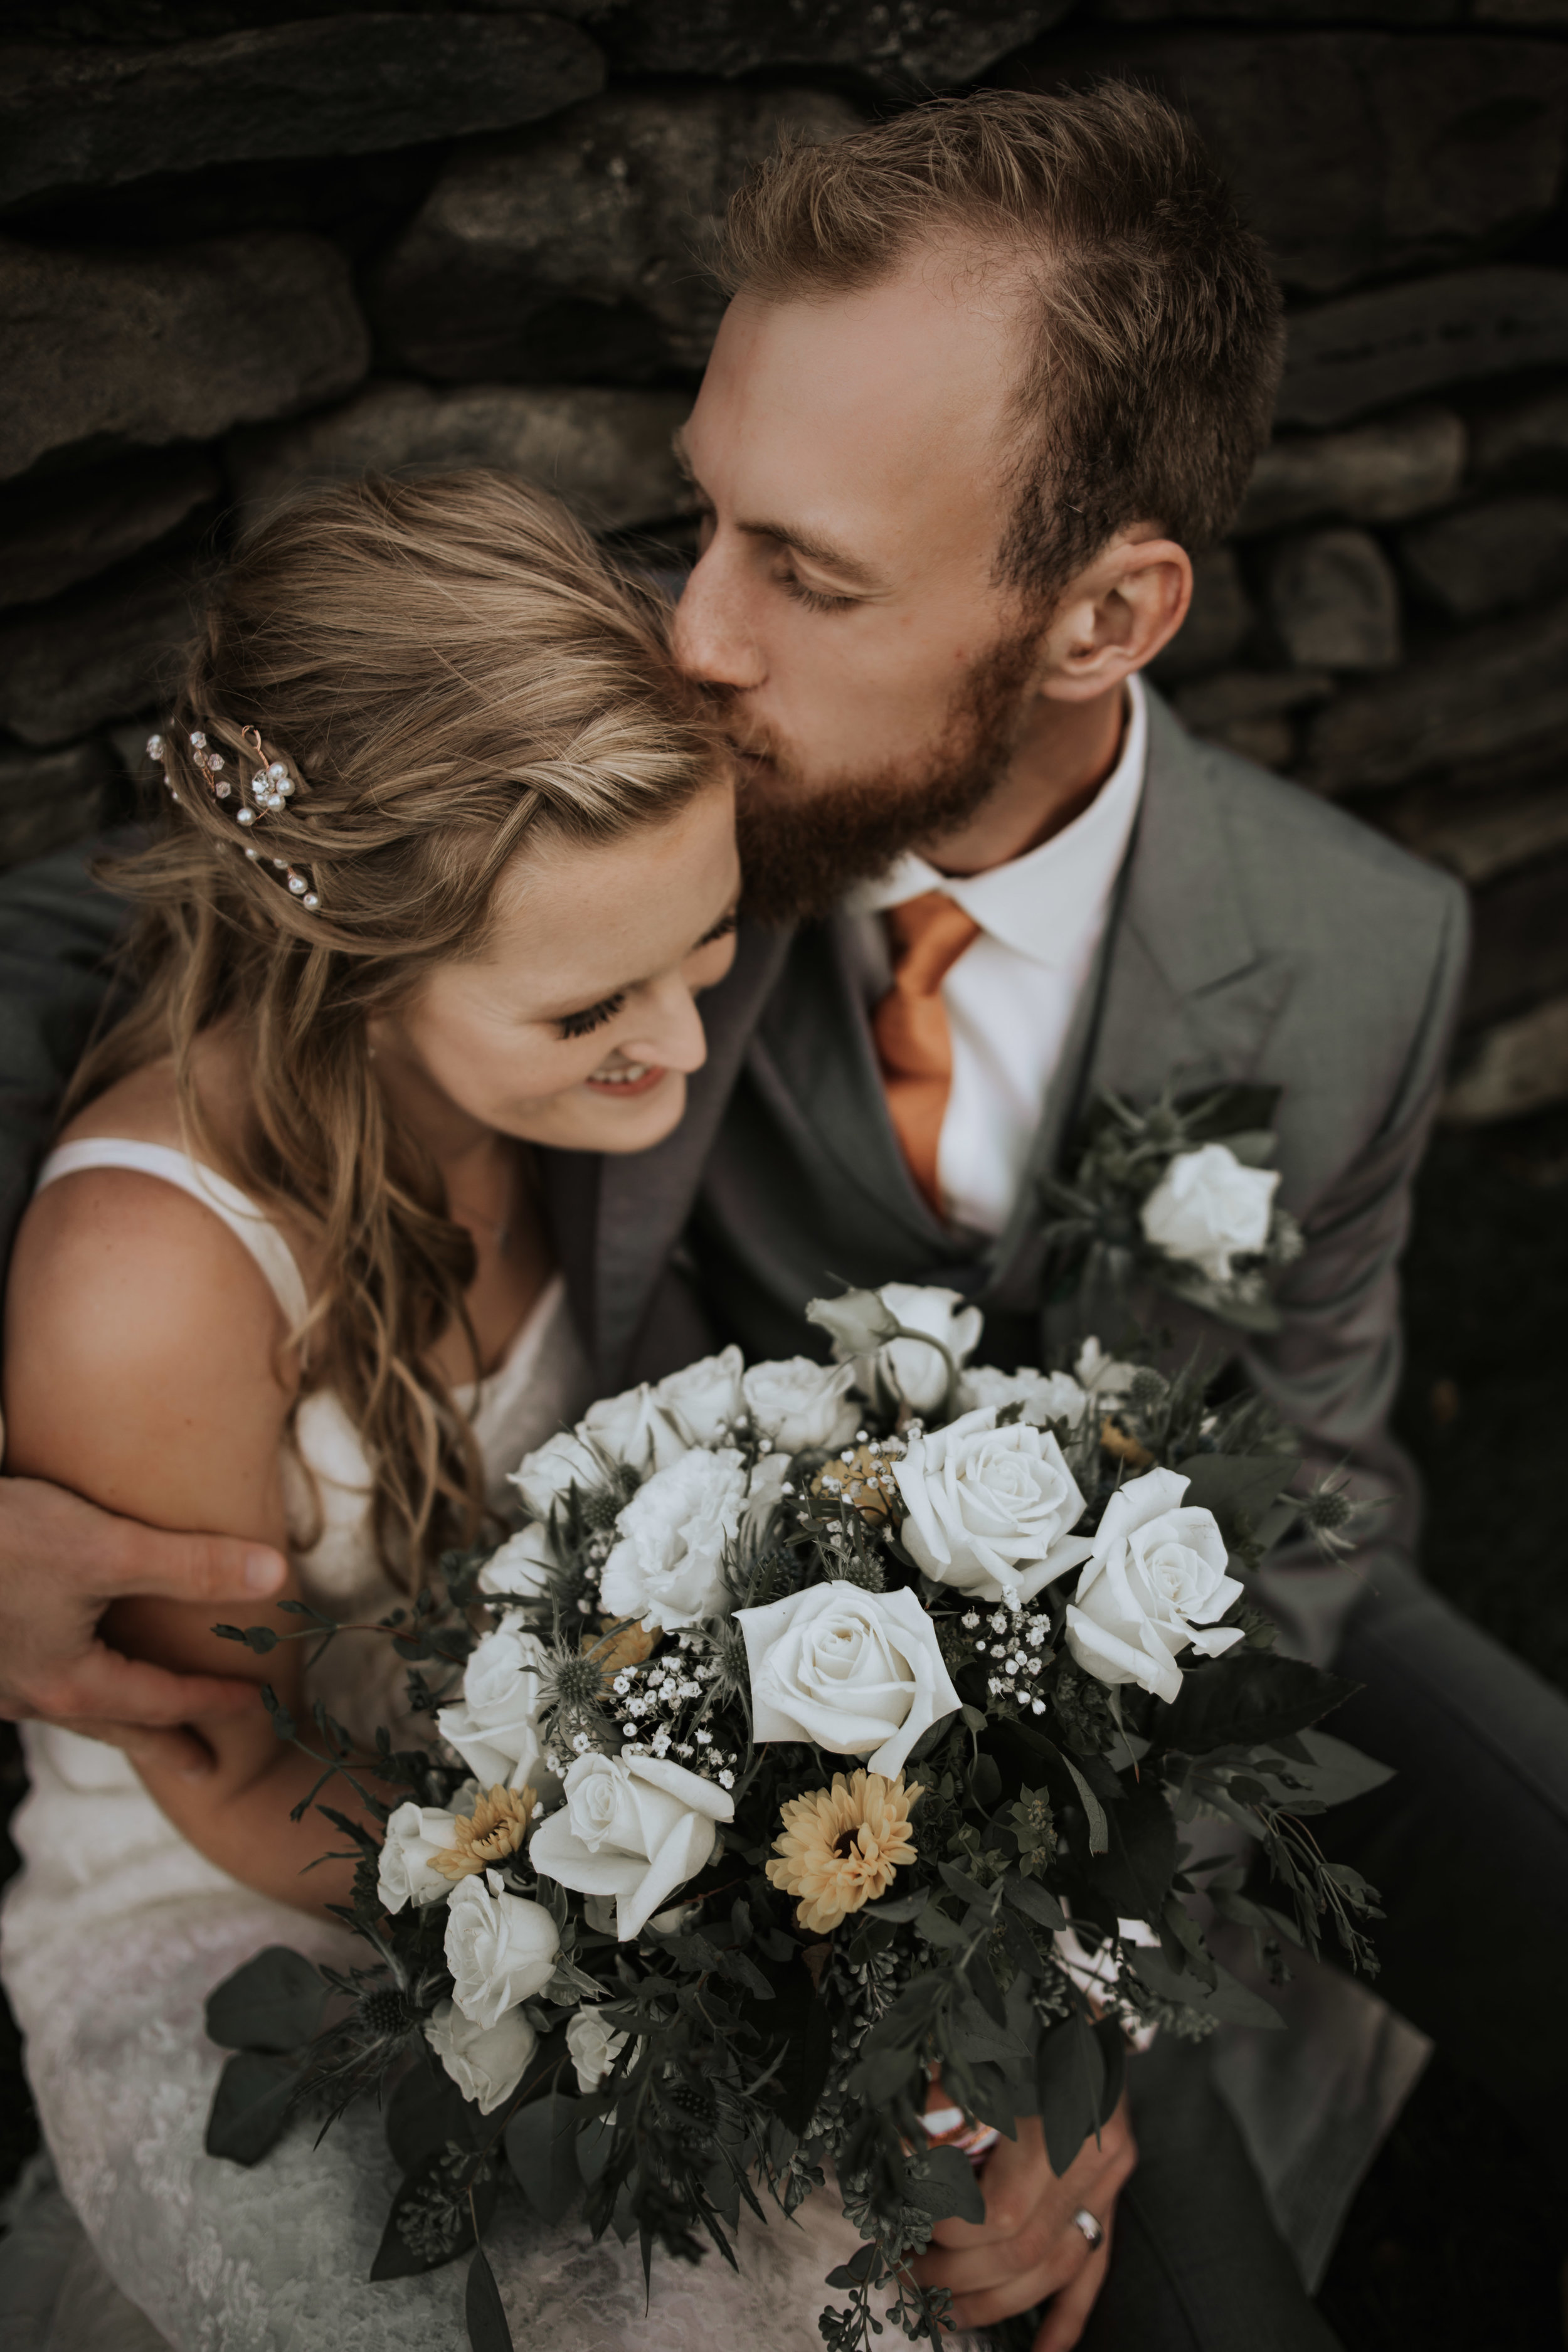 Vermont Wedding | Lorianna Weathers Photography-1075.jpg